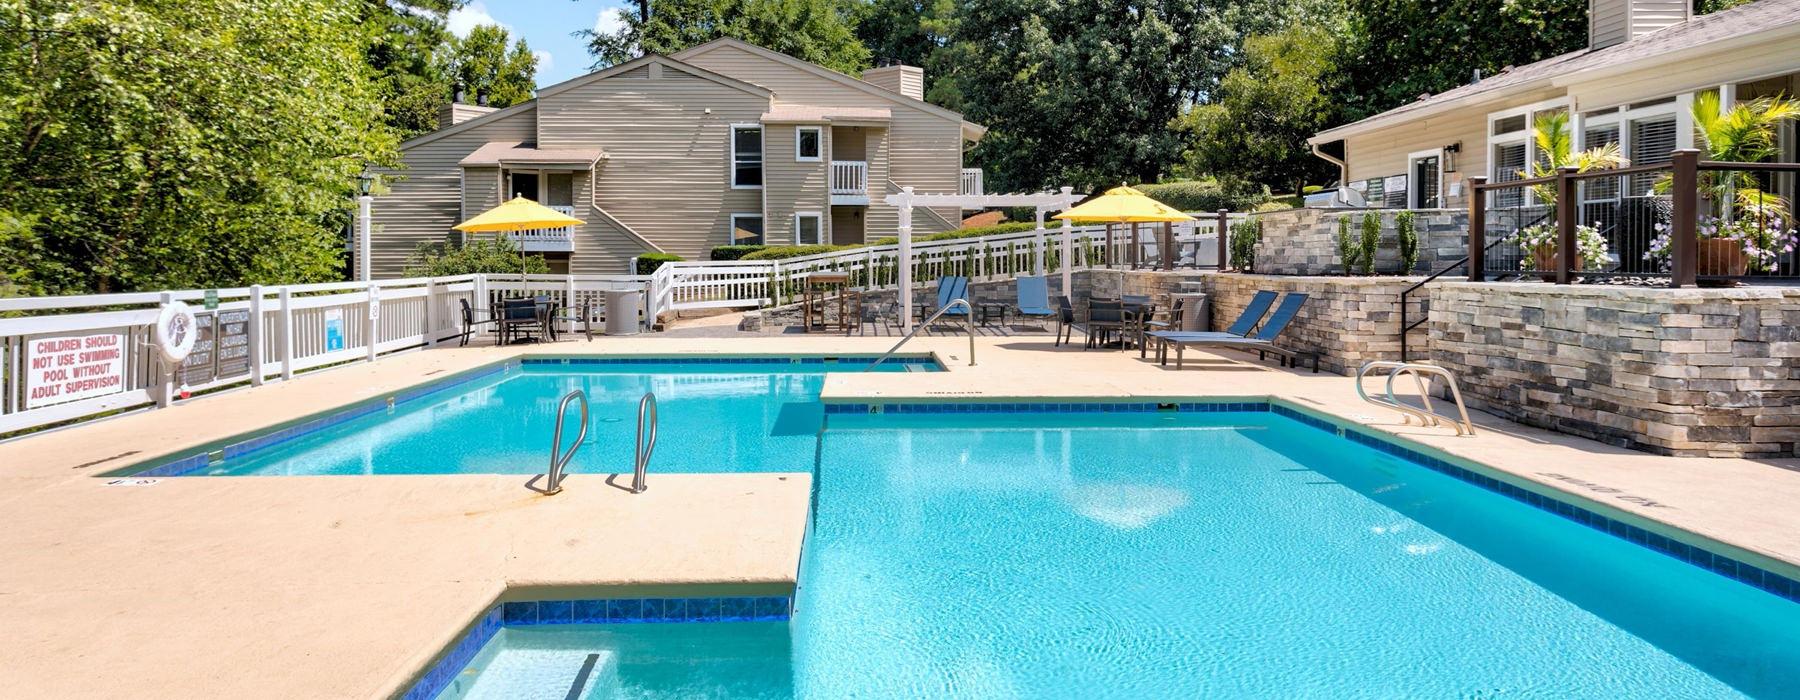 handicap ramp to pool area